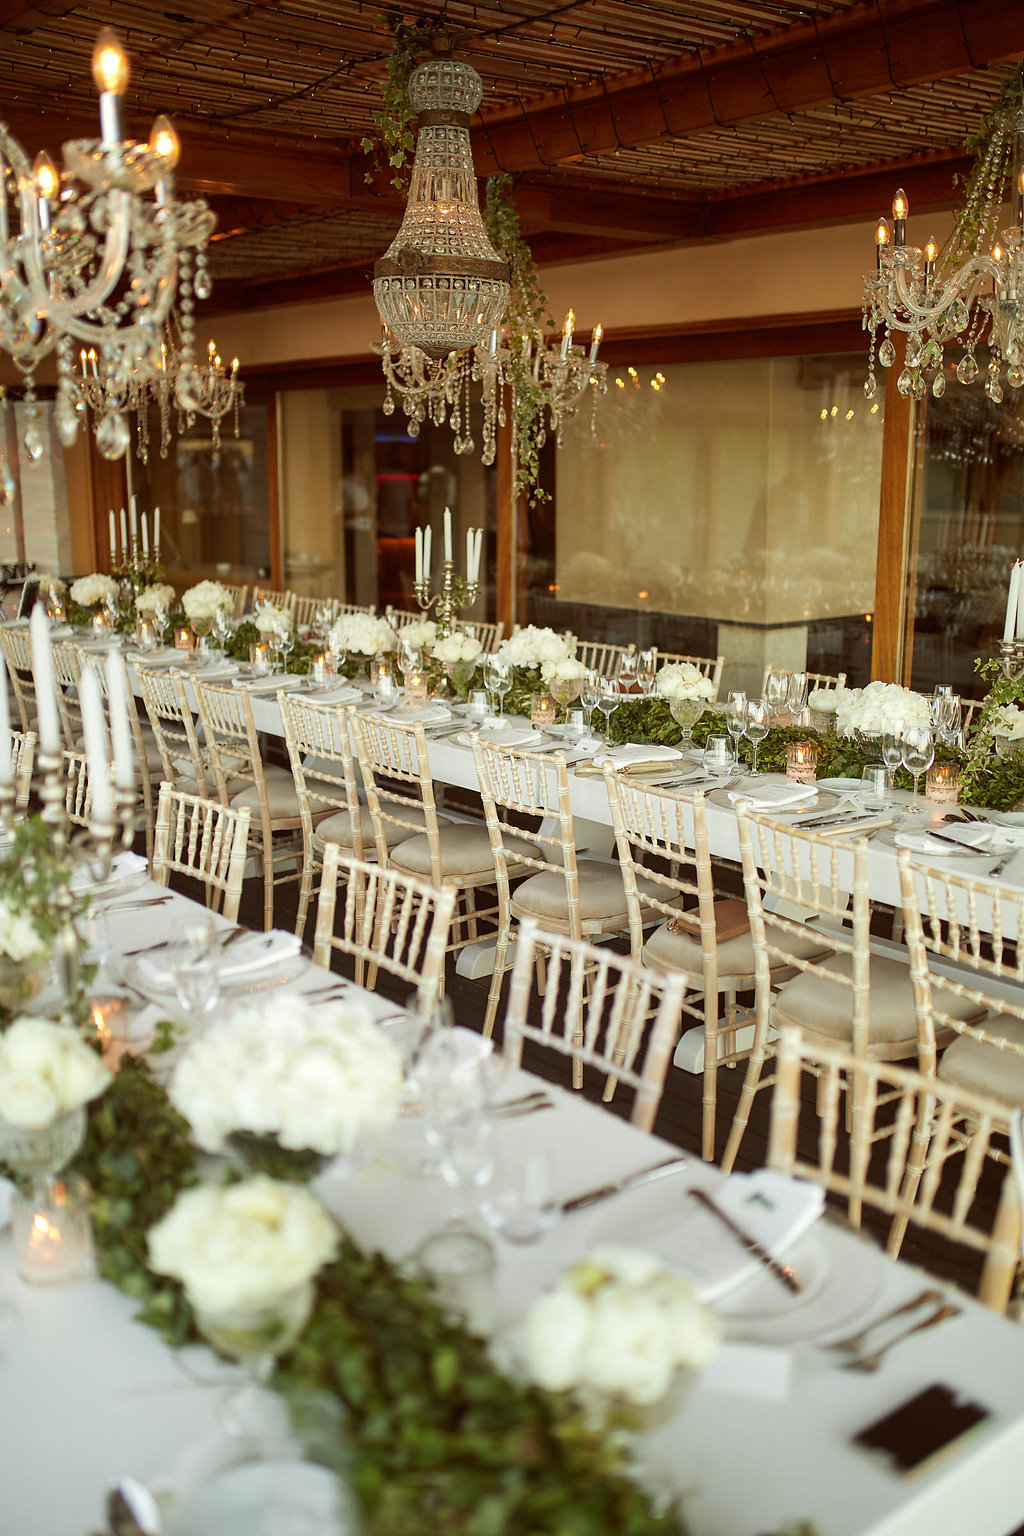 romantic wedding tables - photo by Sotiris Tsakanikas http://ruffledblog.com/chic-sunset-wedding-on-the-athens-riviera